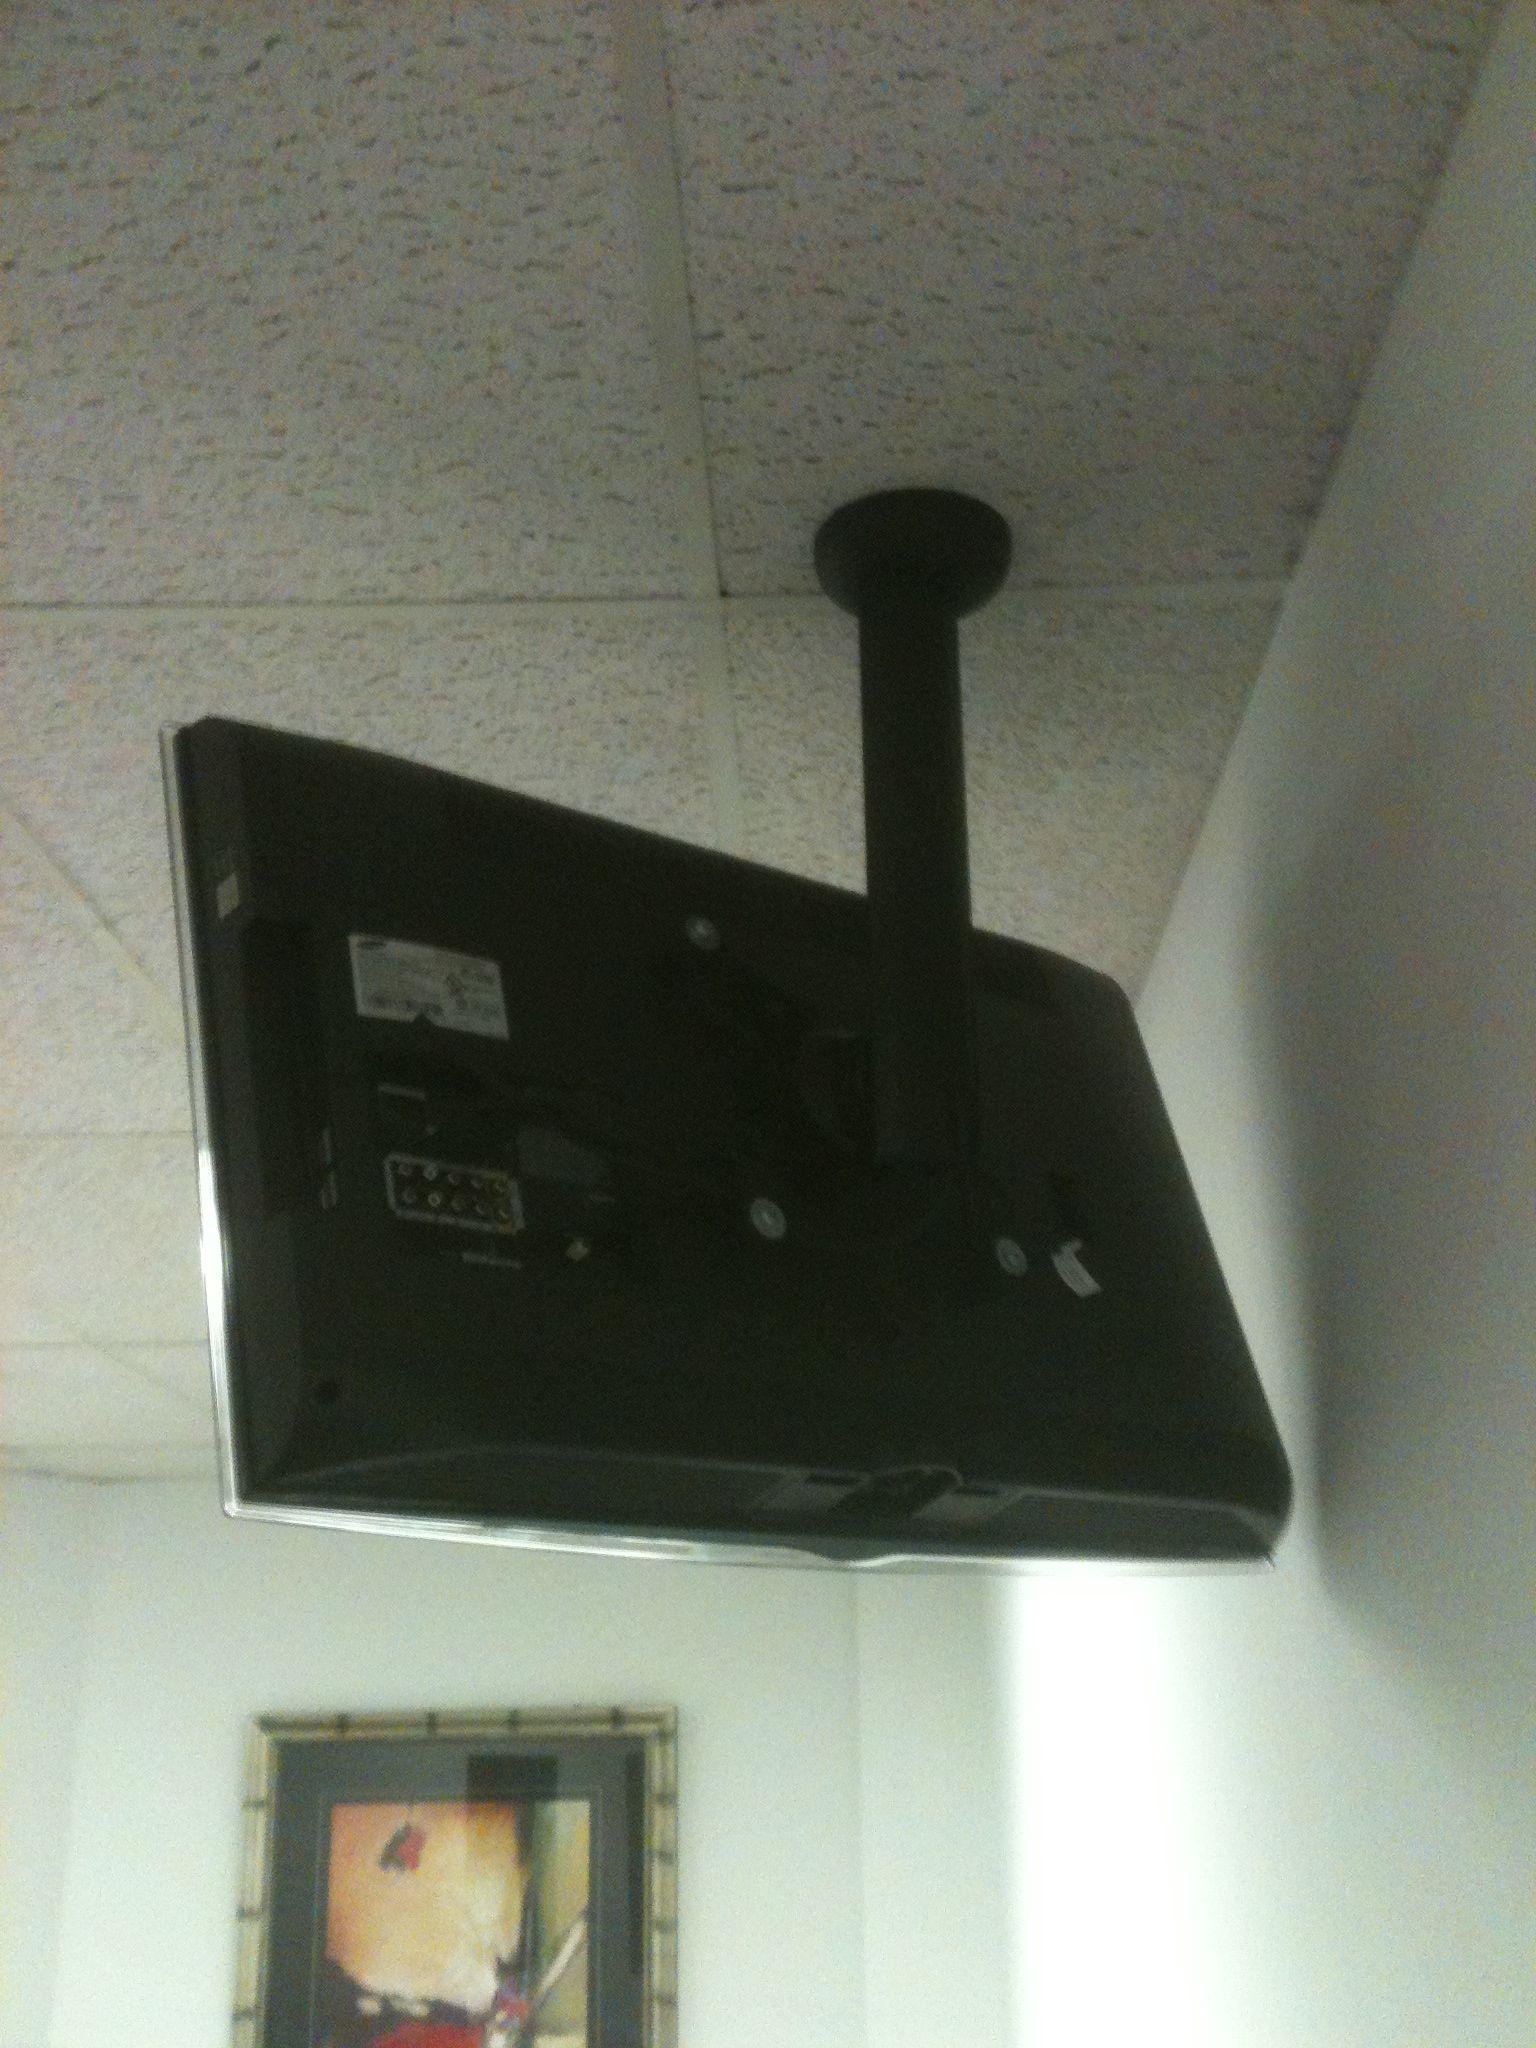 Ceiling Mount Tv Bracket Wires Hidden Inside Downpipe Tv Stand